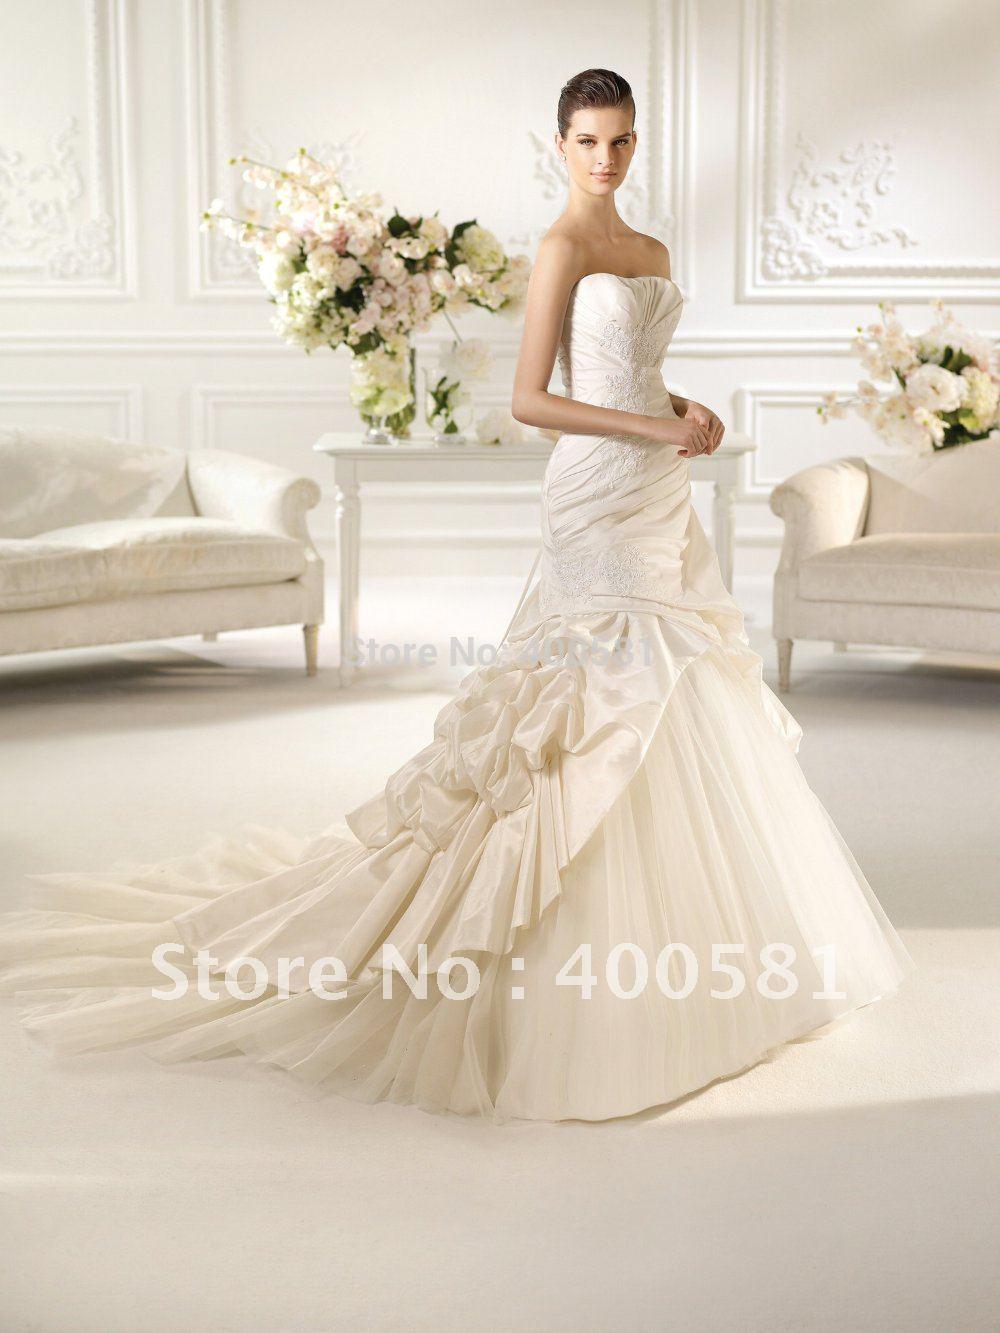 Spectacular Wedding Dresses